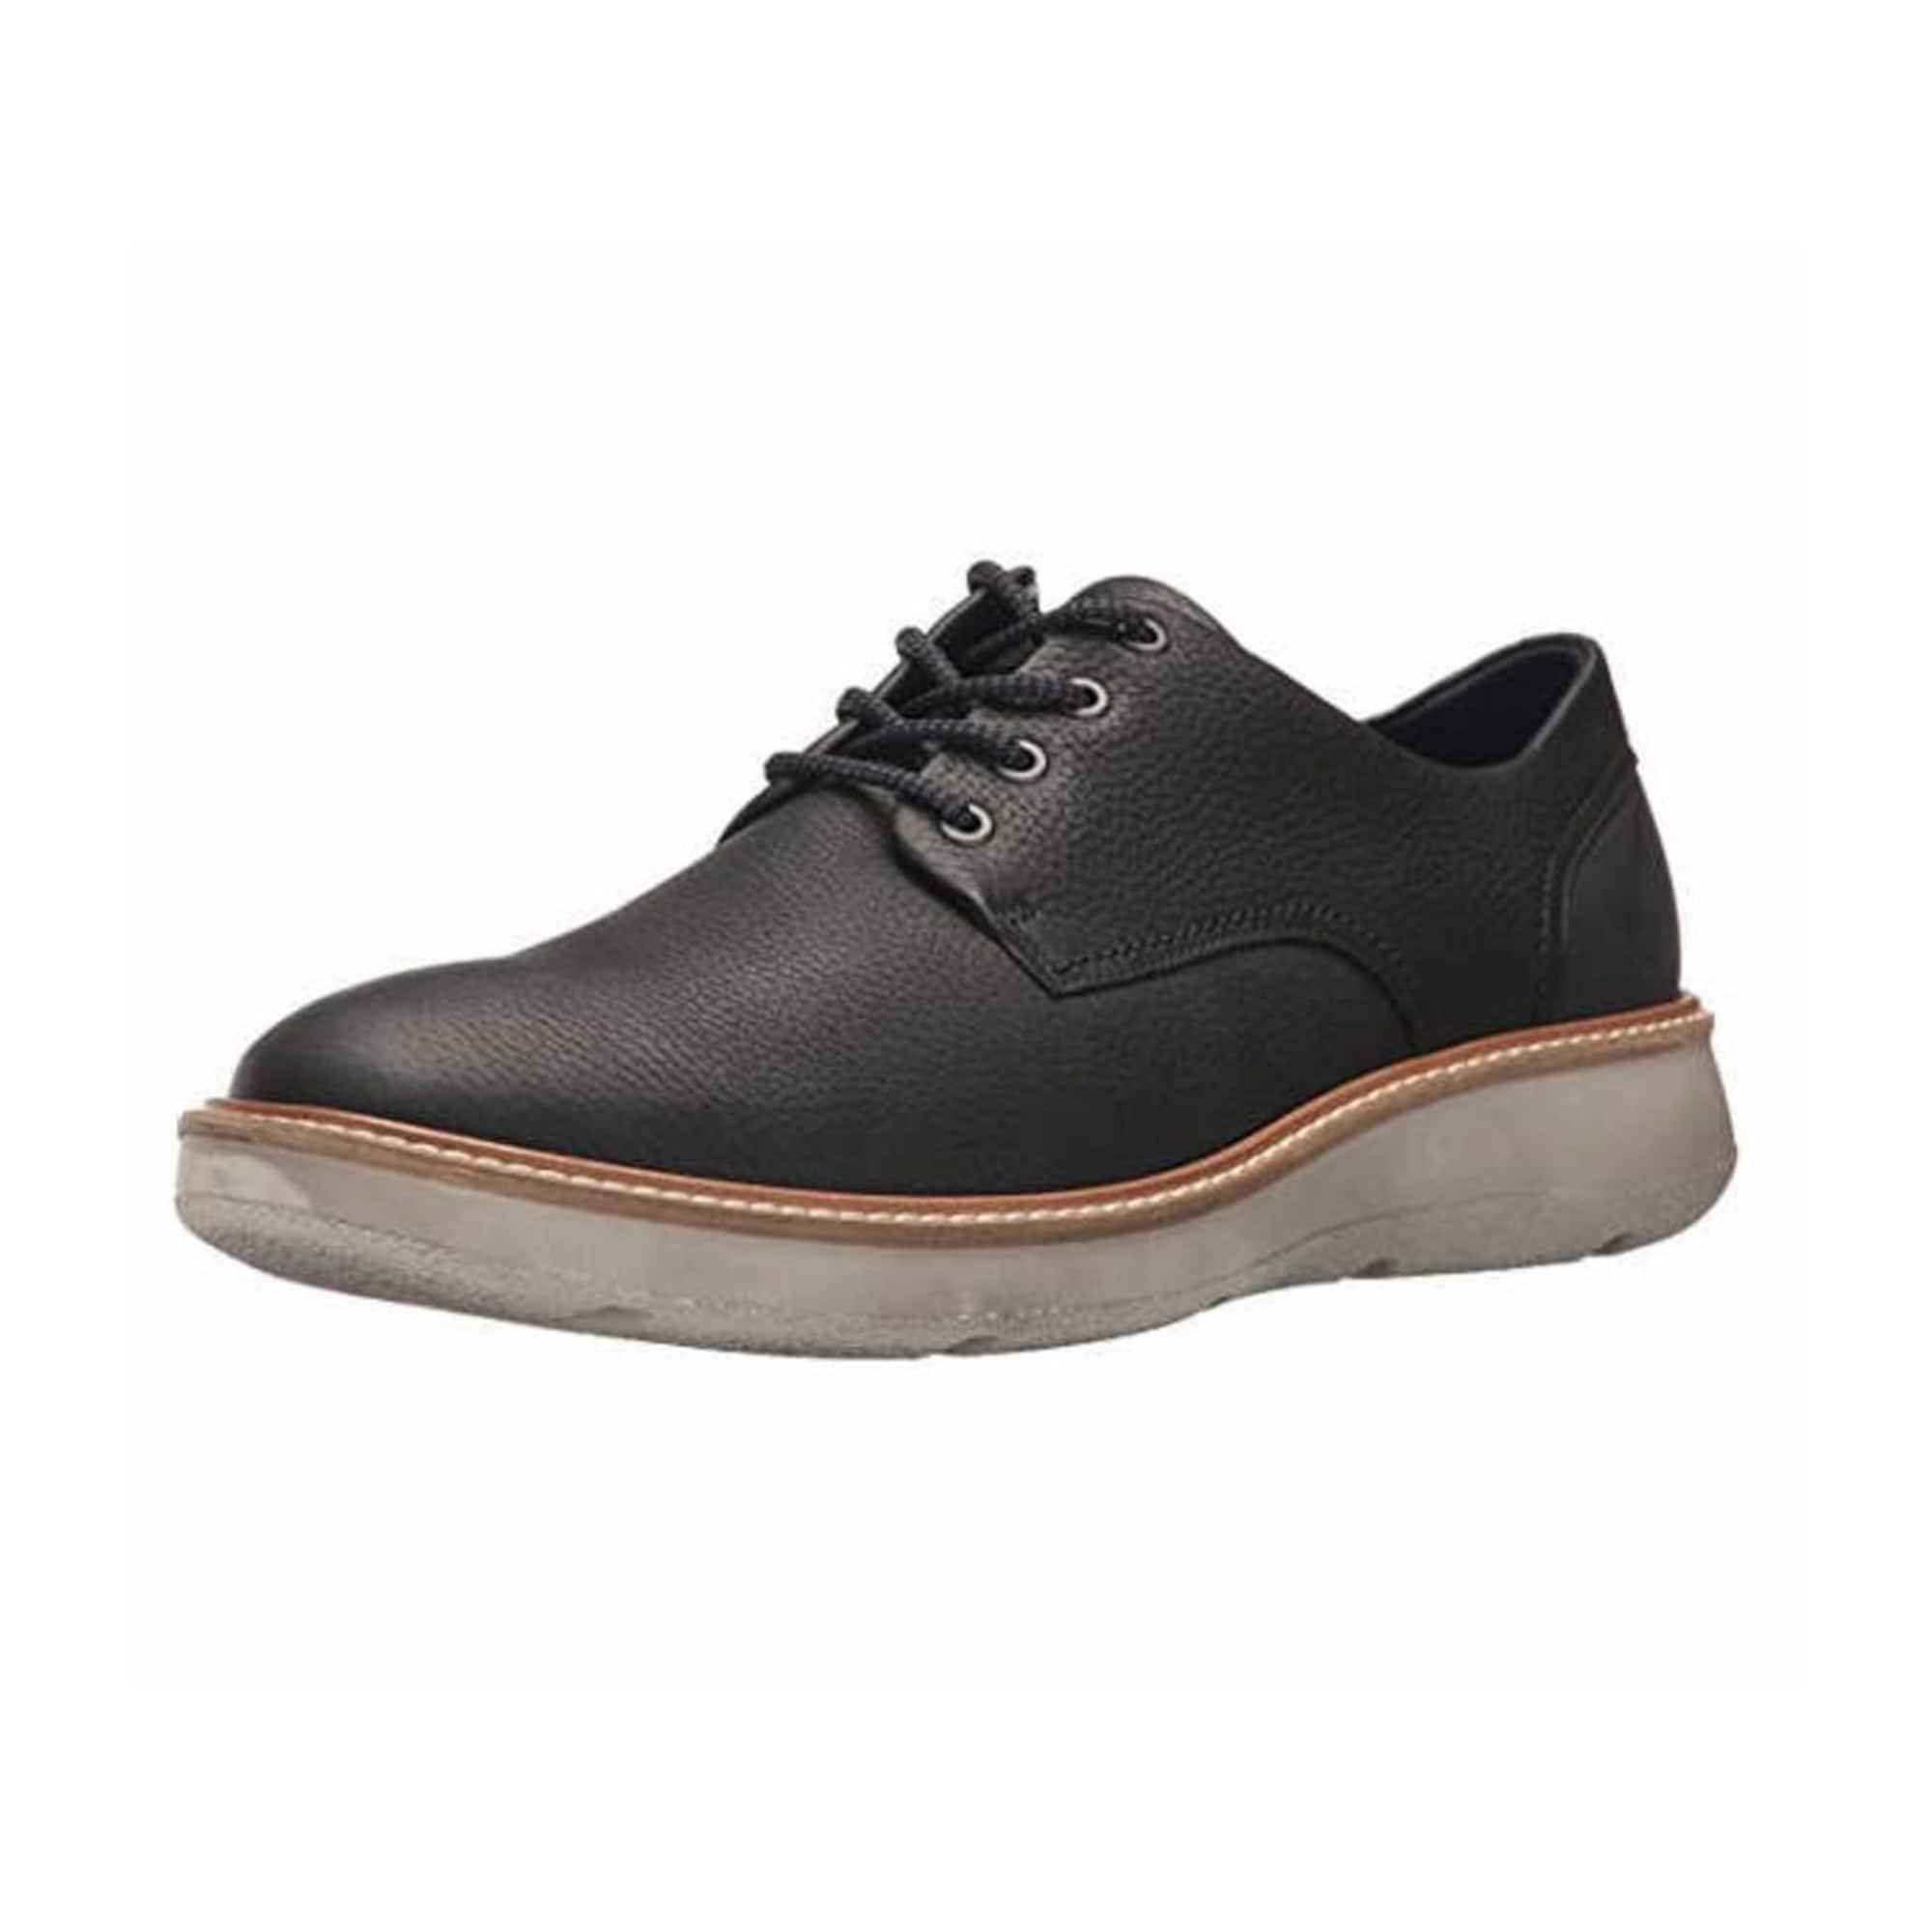 Schnürschuhe | Schuhe > Schnürschuhe | ECCO